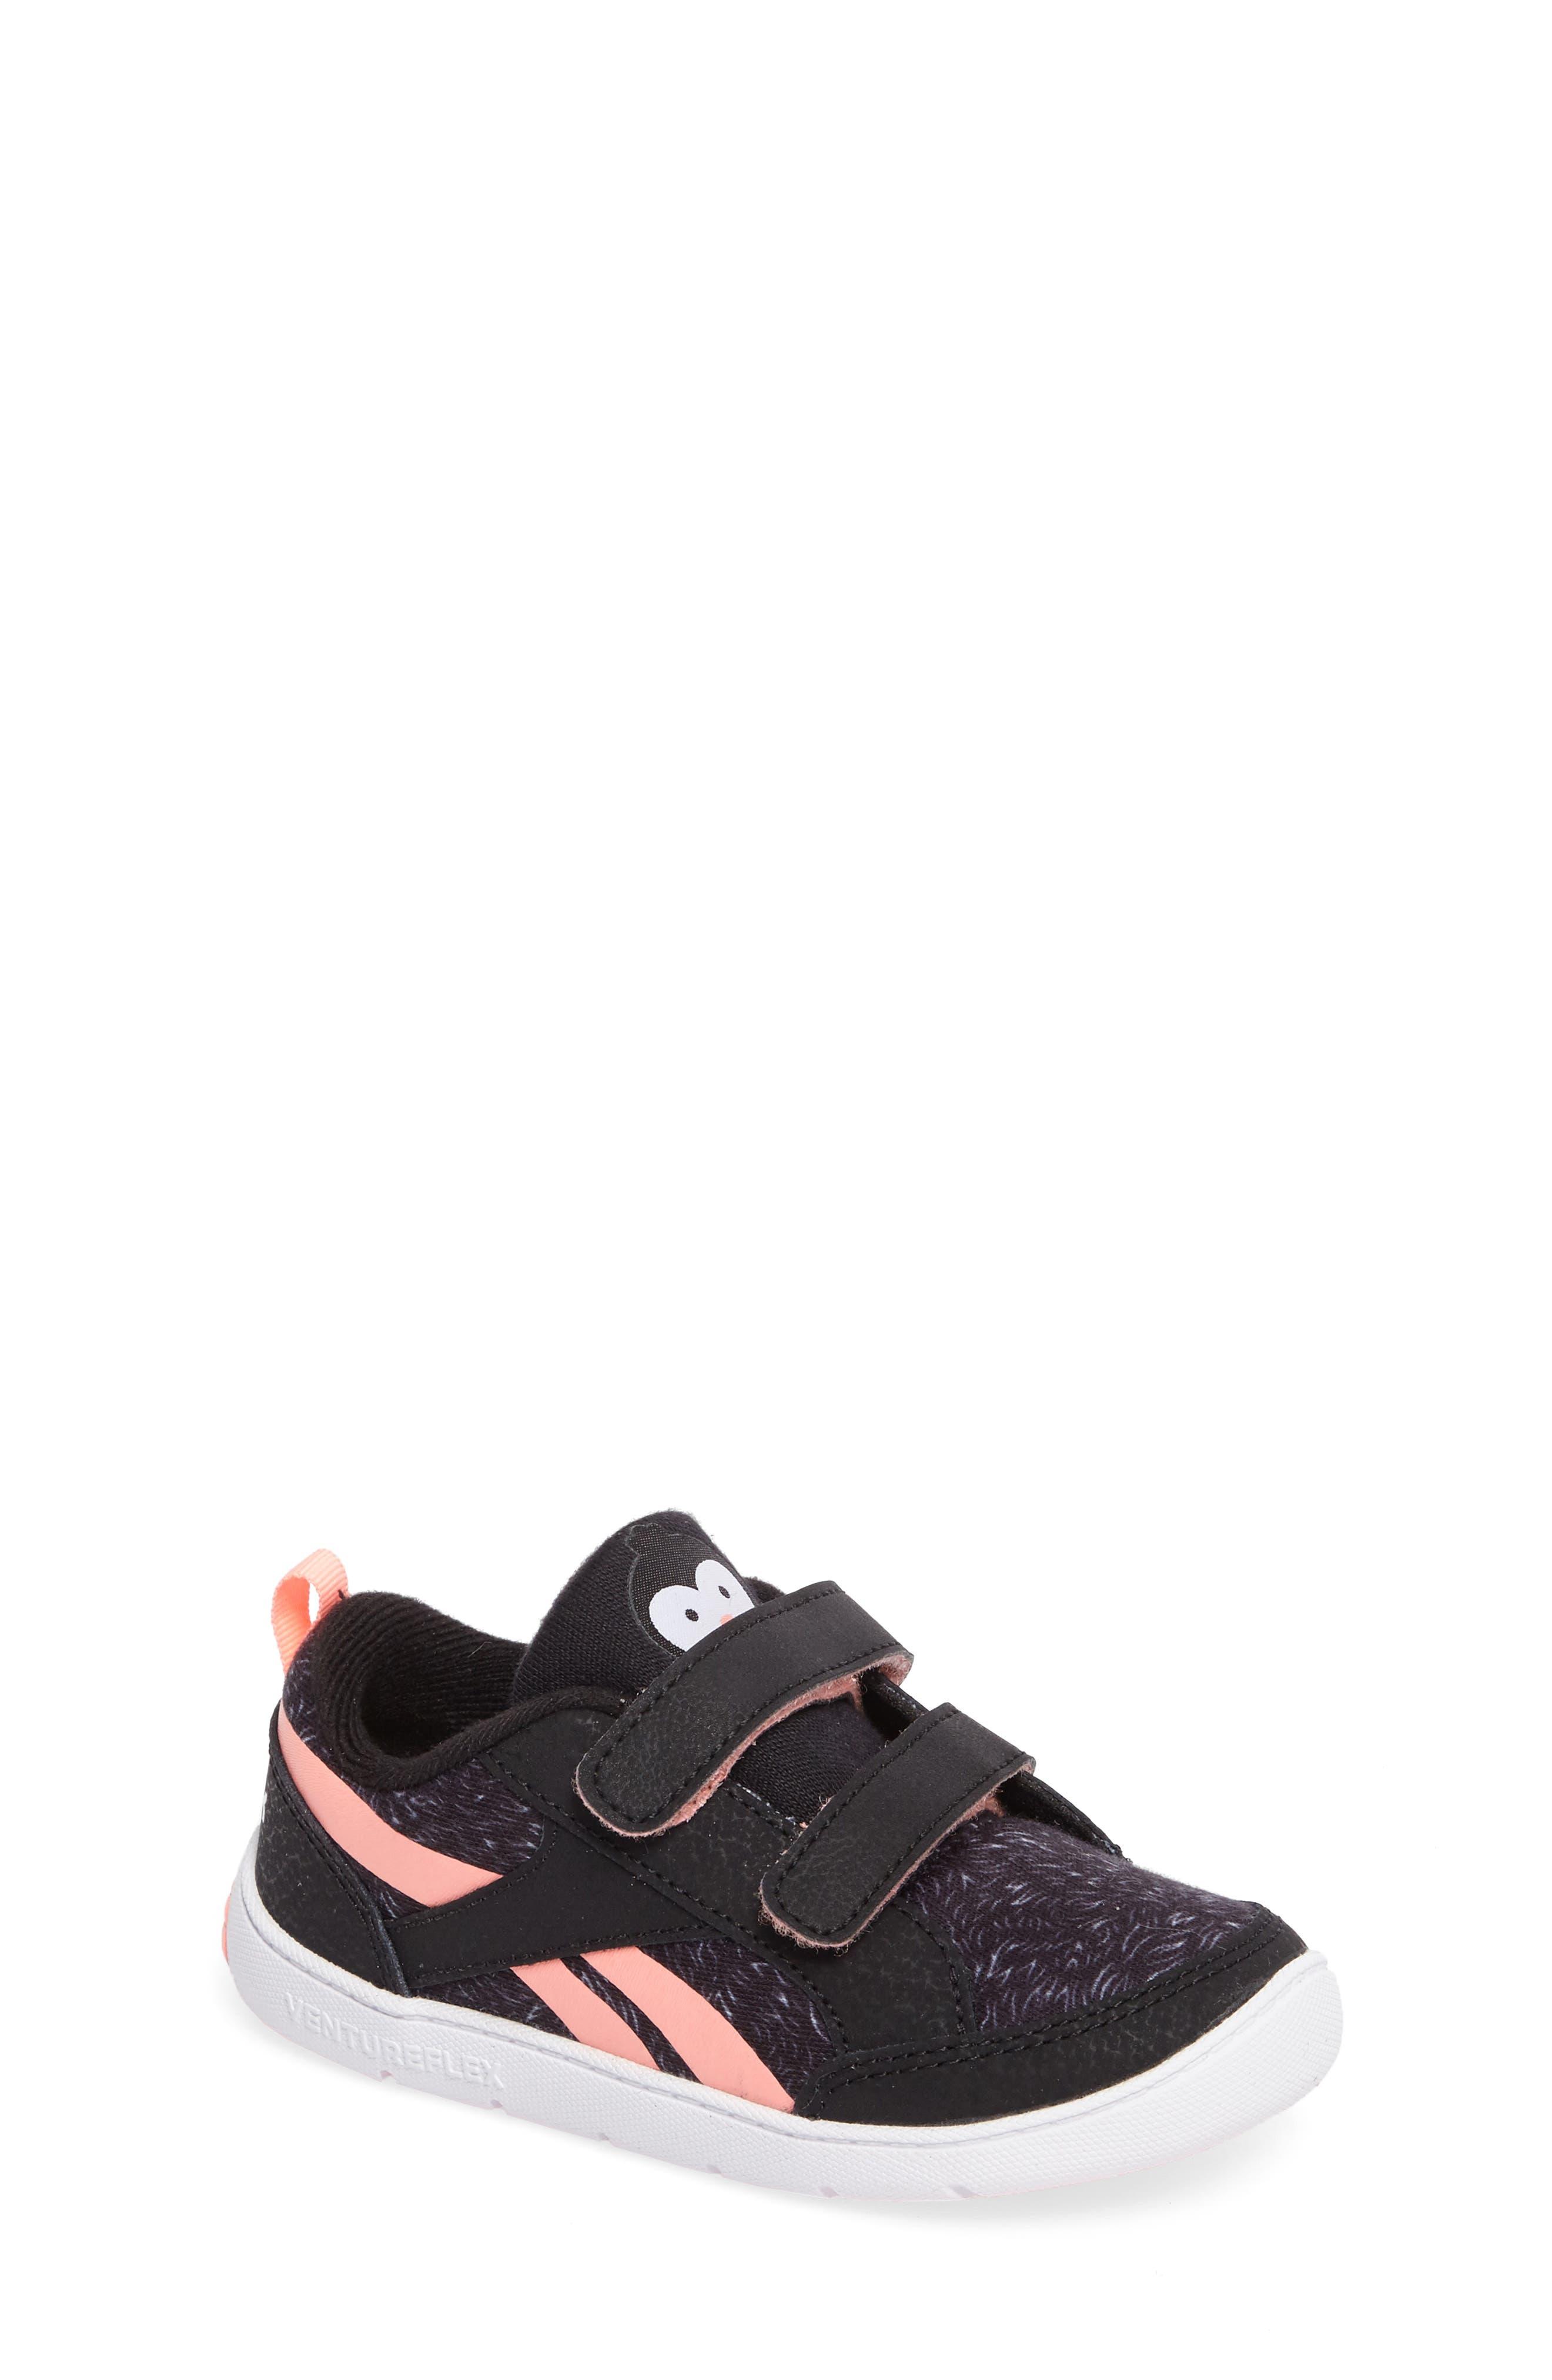 Ventureflex Critter Feet Sneaker,                             Main thumbnail 1, color,                             Artic Black/ White/ Sour Melon